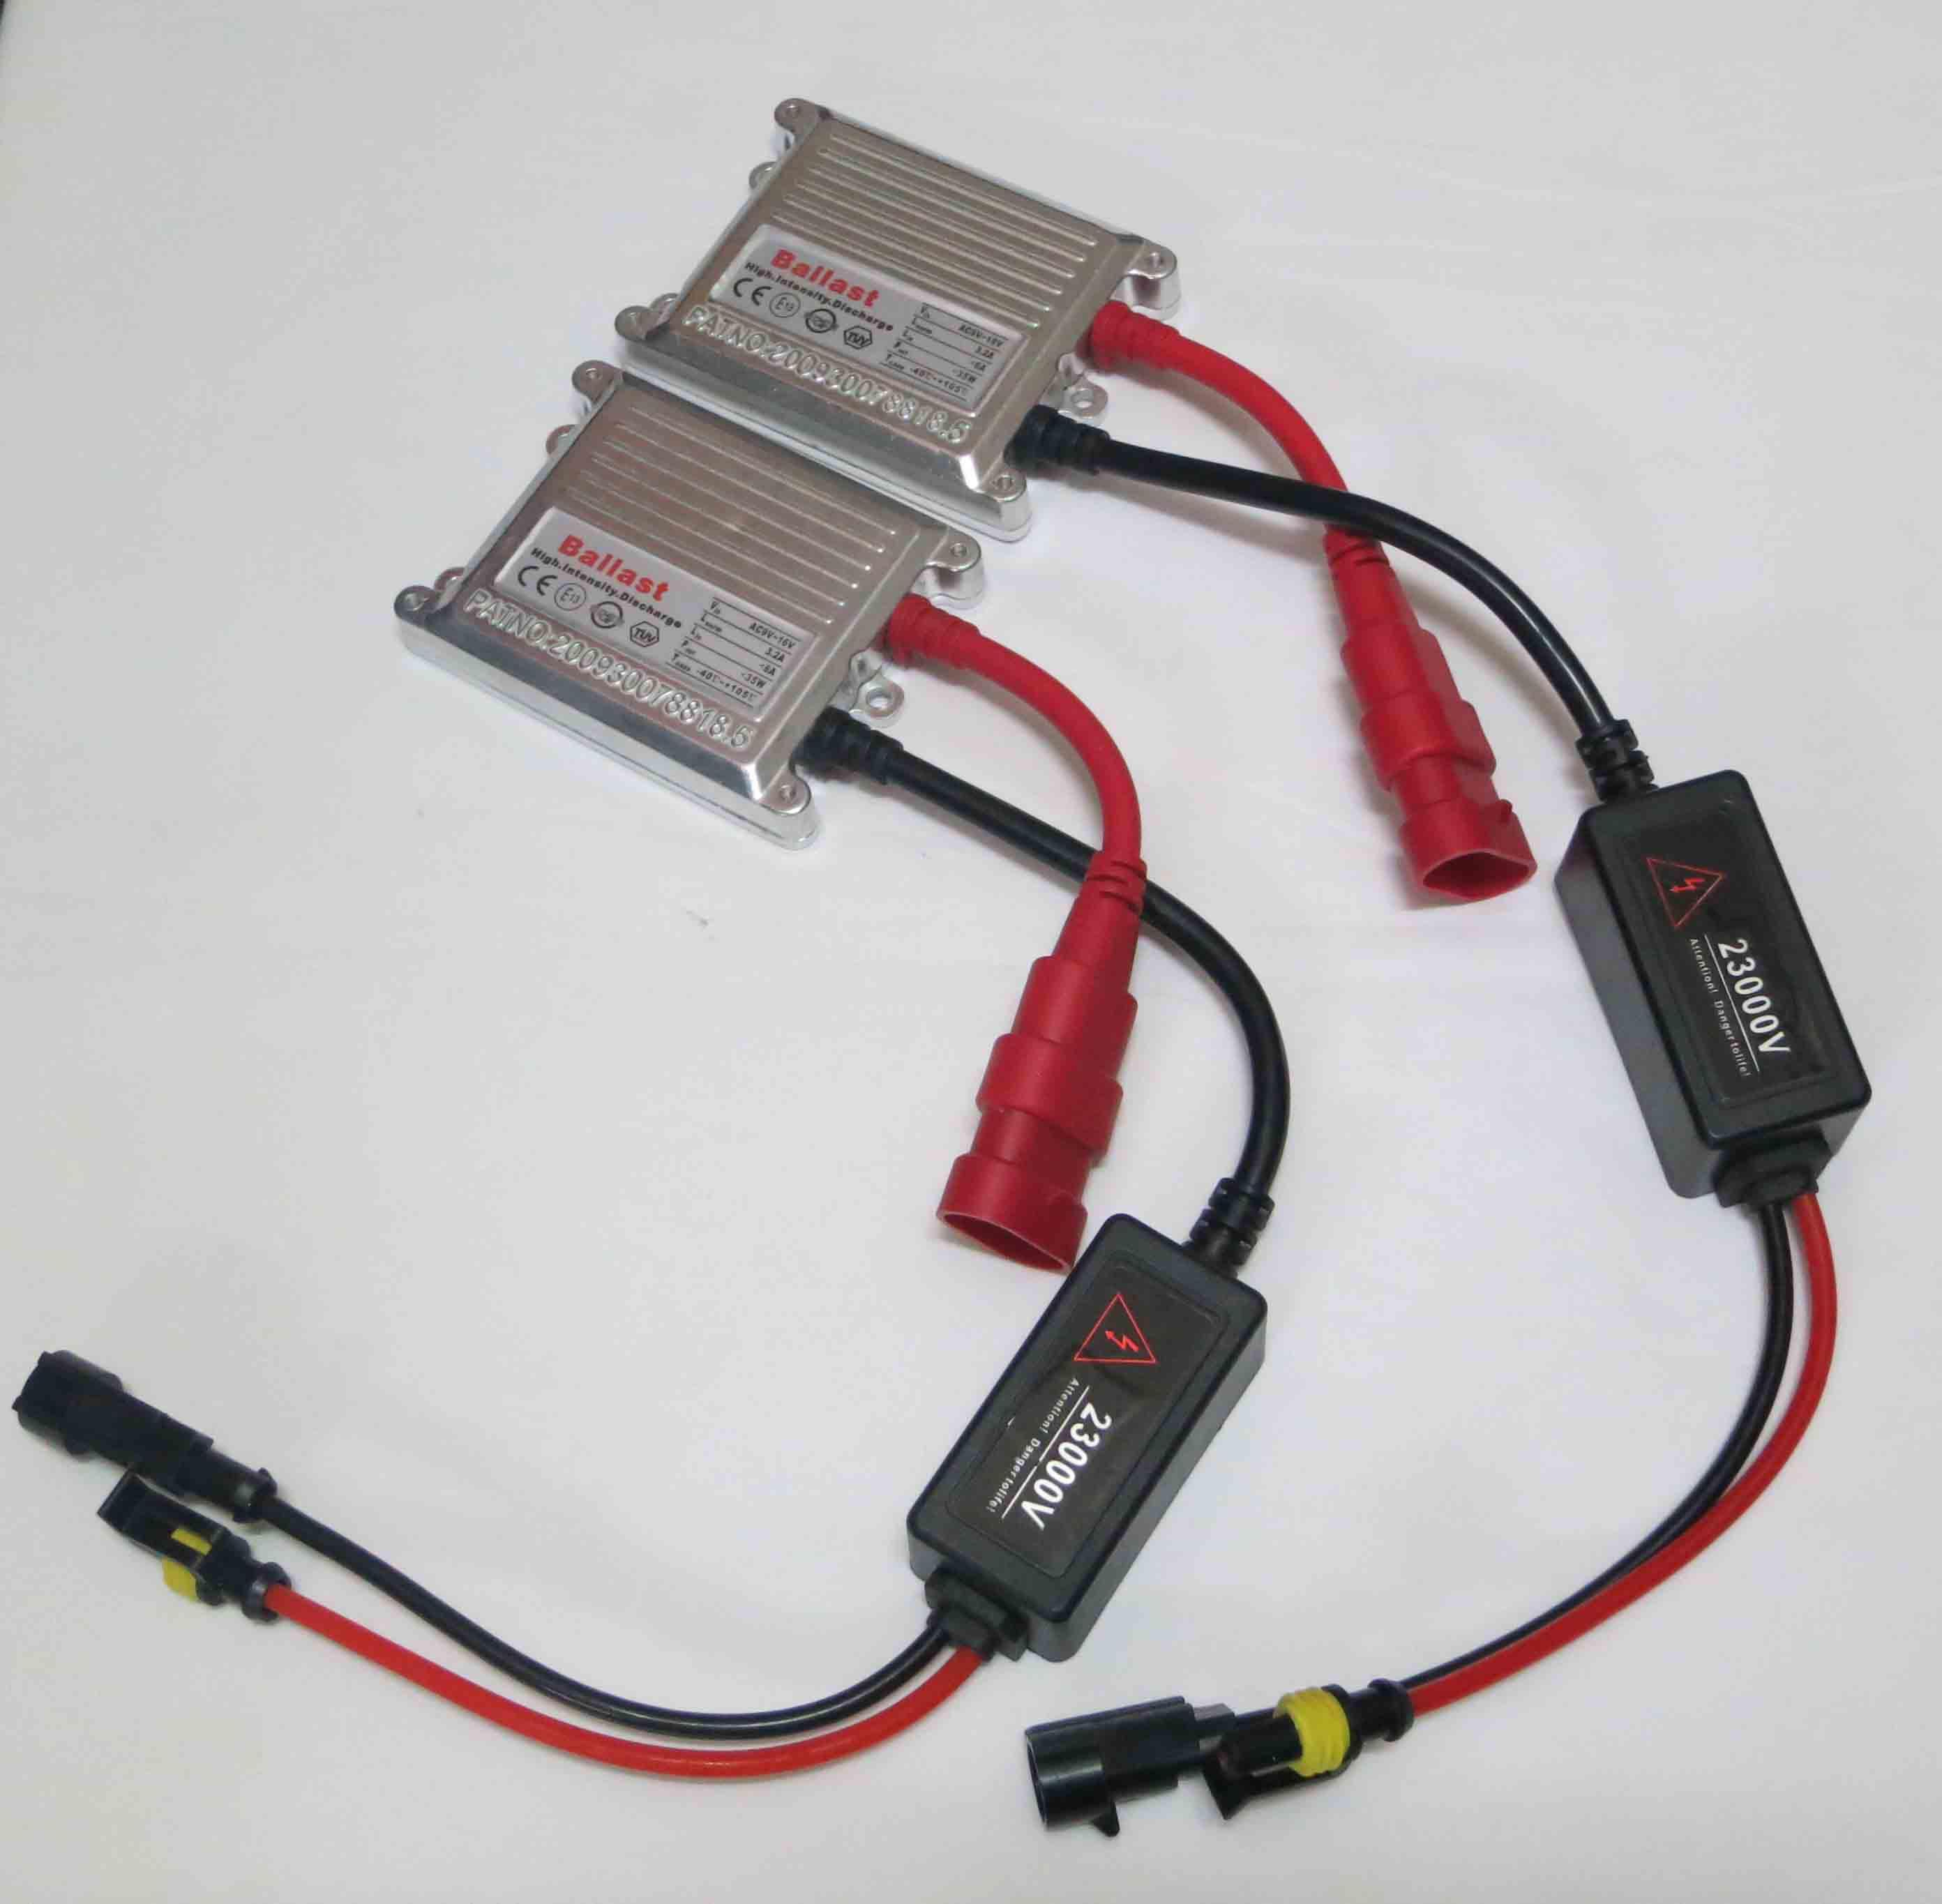 35W AC 실버 슬림 안정기 HID 크세논 교체 디지털 슬림 밸러스트 유니버설 특허받은 12V